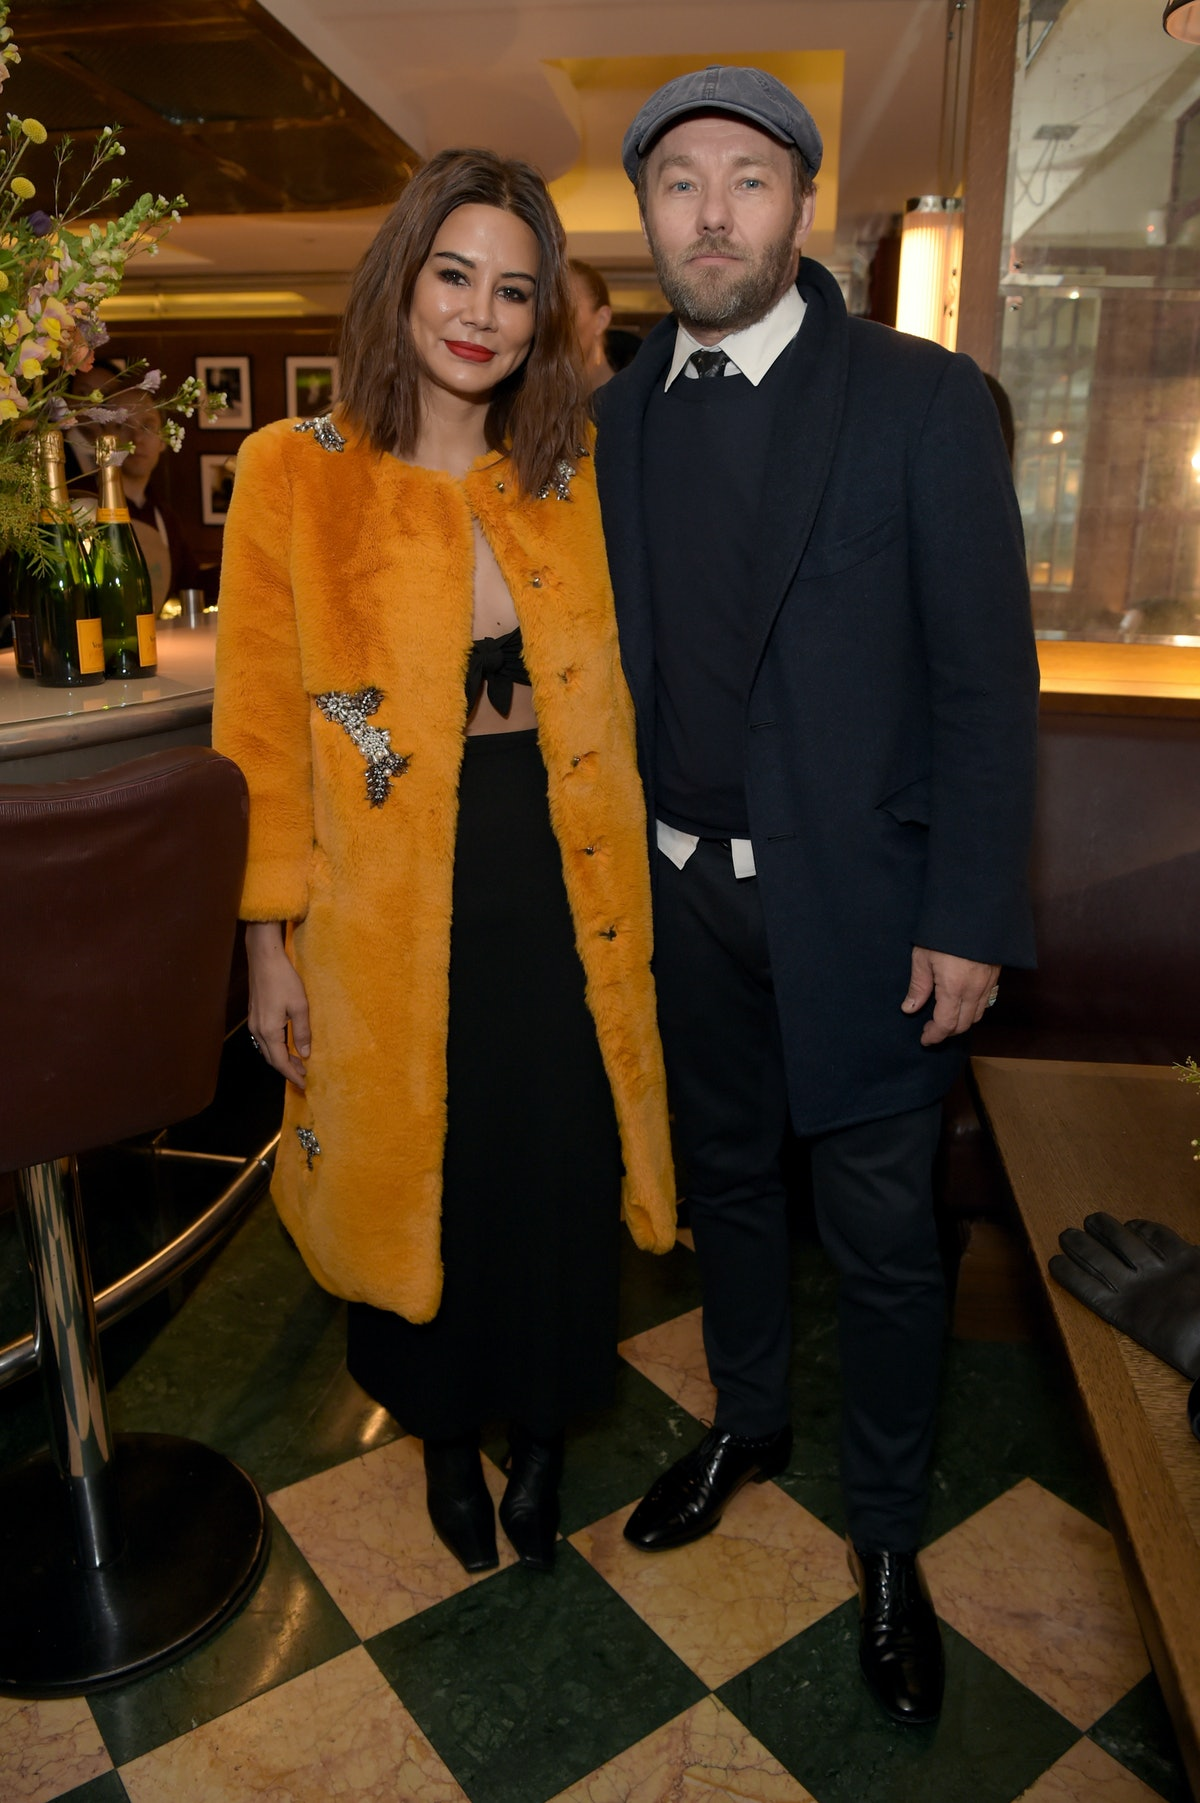 The Official Erdem London Fashion Week Dinner At J Sheekey Atlantic Bar